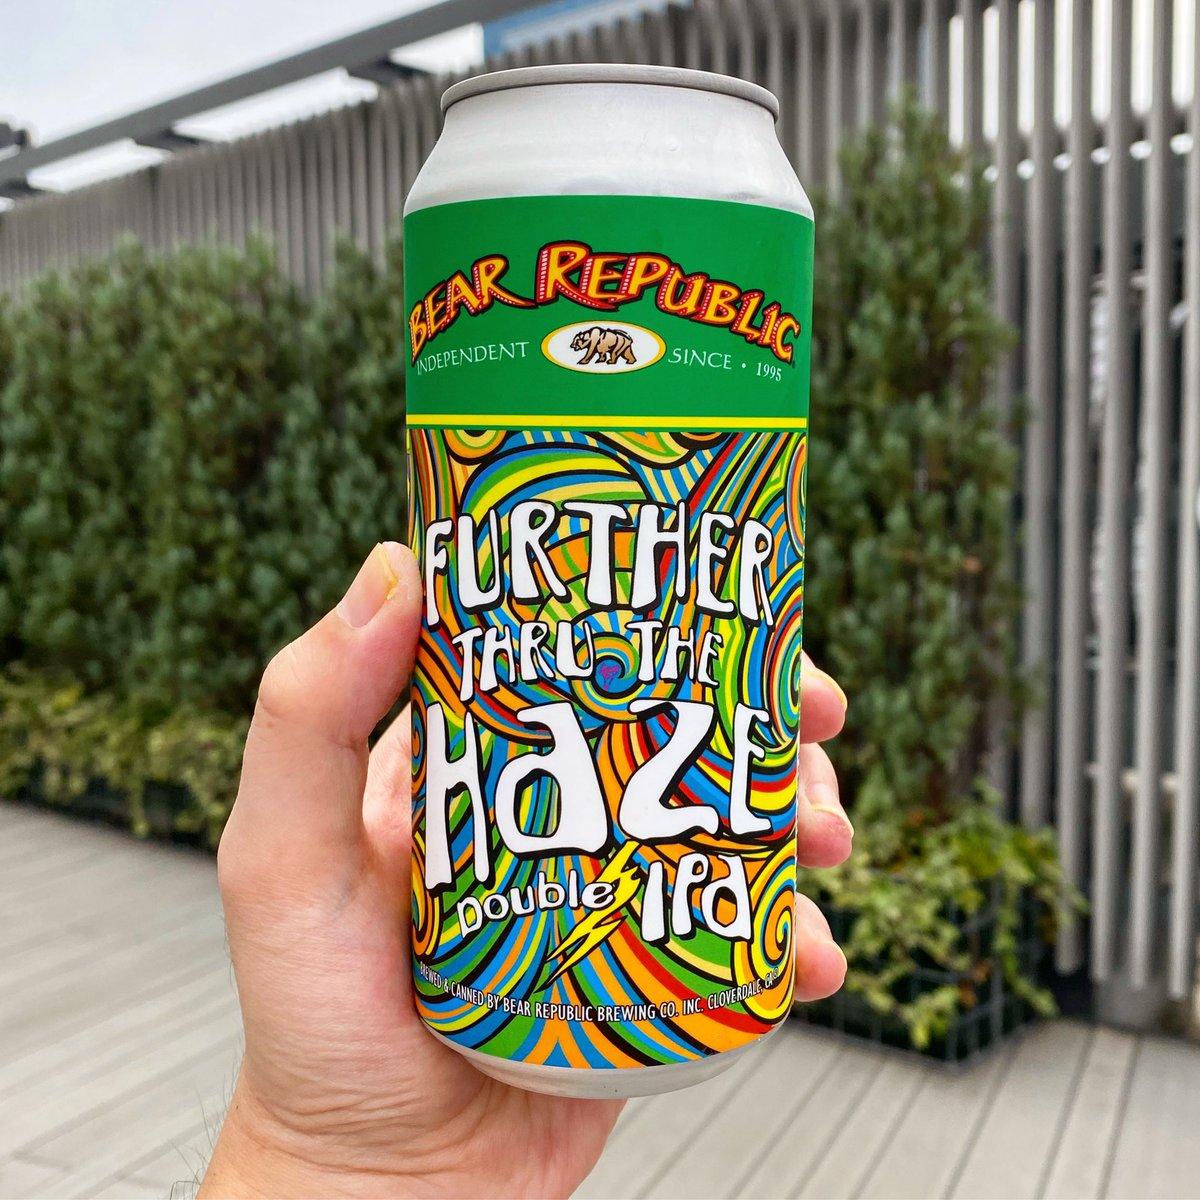 「TENET」の感想話しながら、Bear Republic BrewingのFurther Thru The Haze。池袋西武の屋上はいつも俺たちの駄話を受け止めてくれるな。#craftbeer https://t.co/BzPWEQXRCe